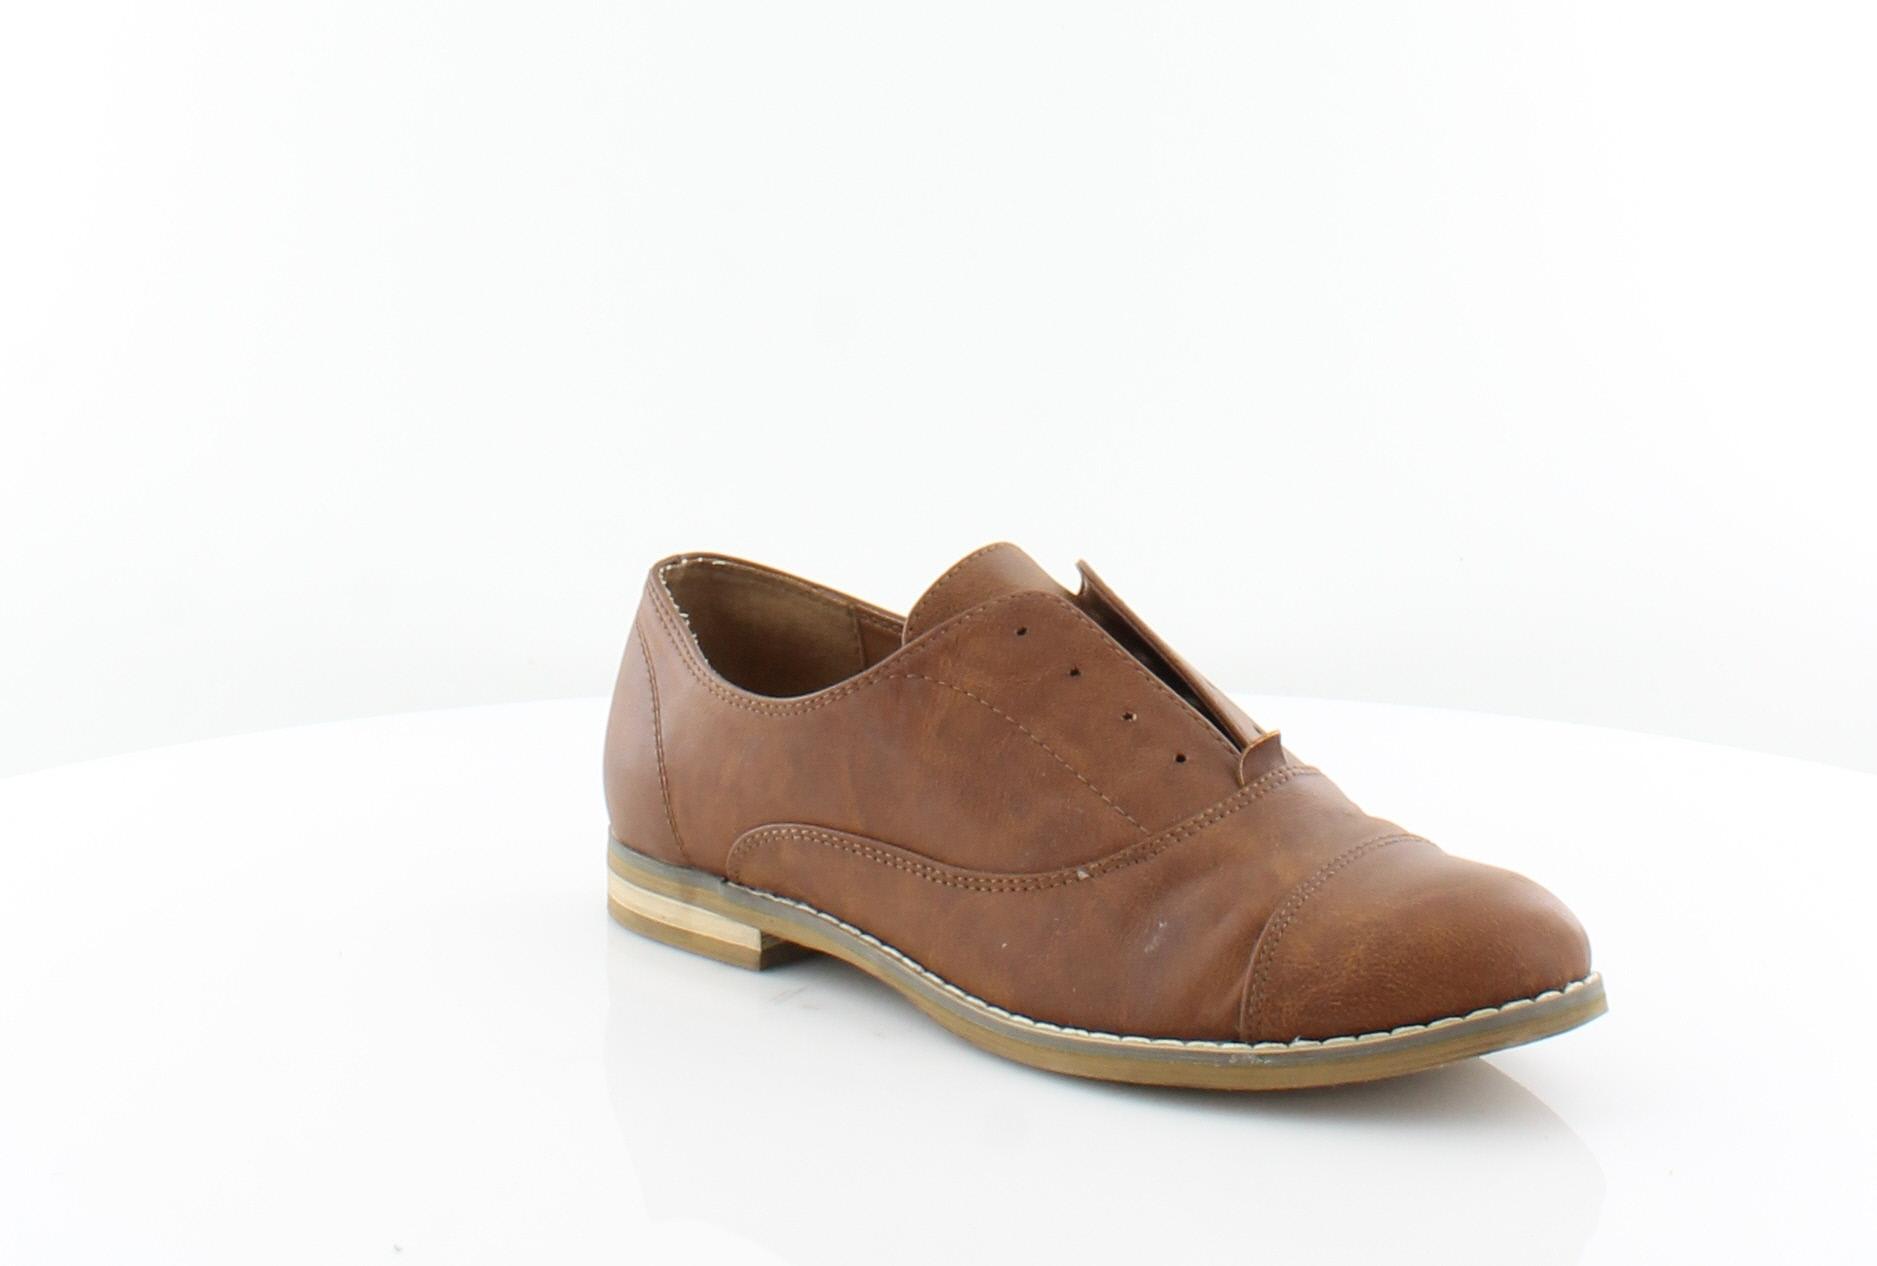 6aad0e13e1f Indigo Rd. Hacksy Brown Womens Shoes Size 6 M Flats MSRP  49 ...